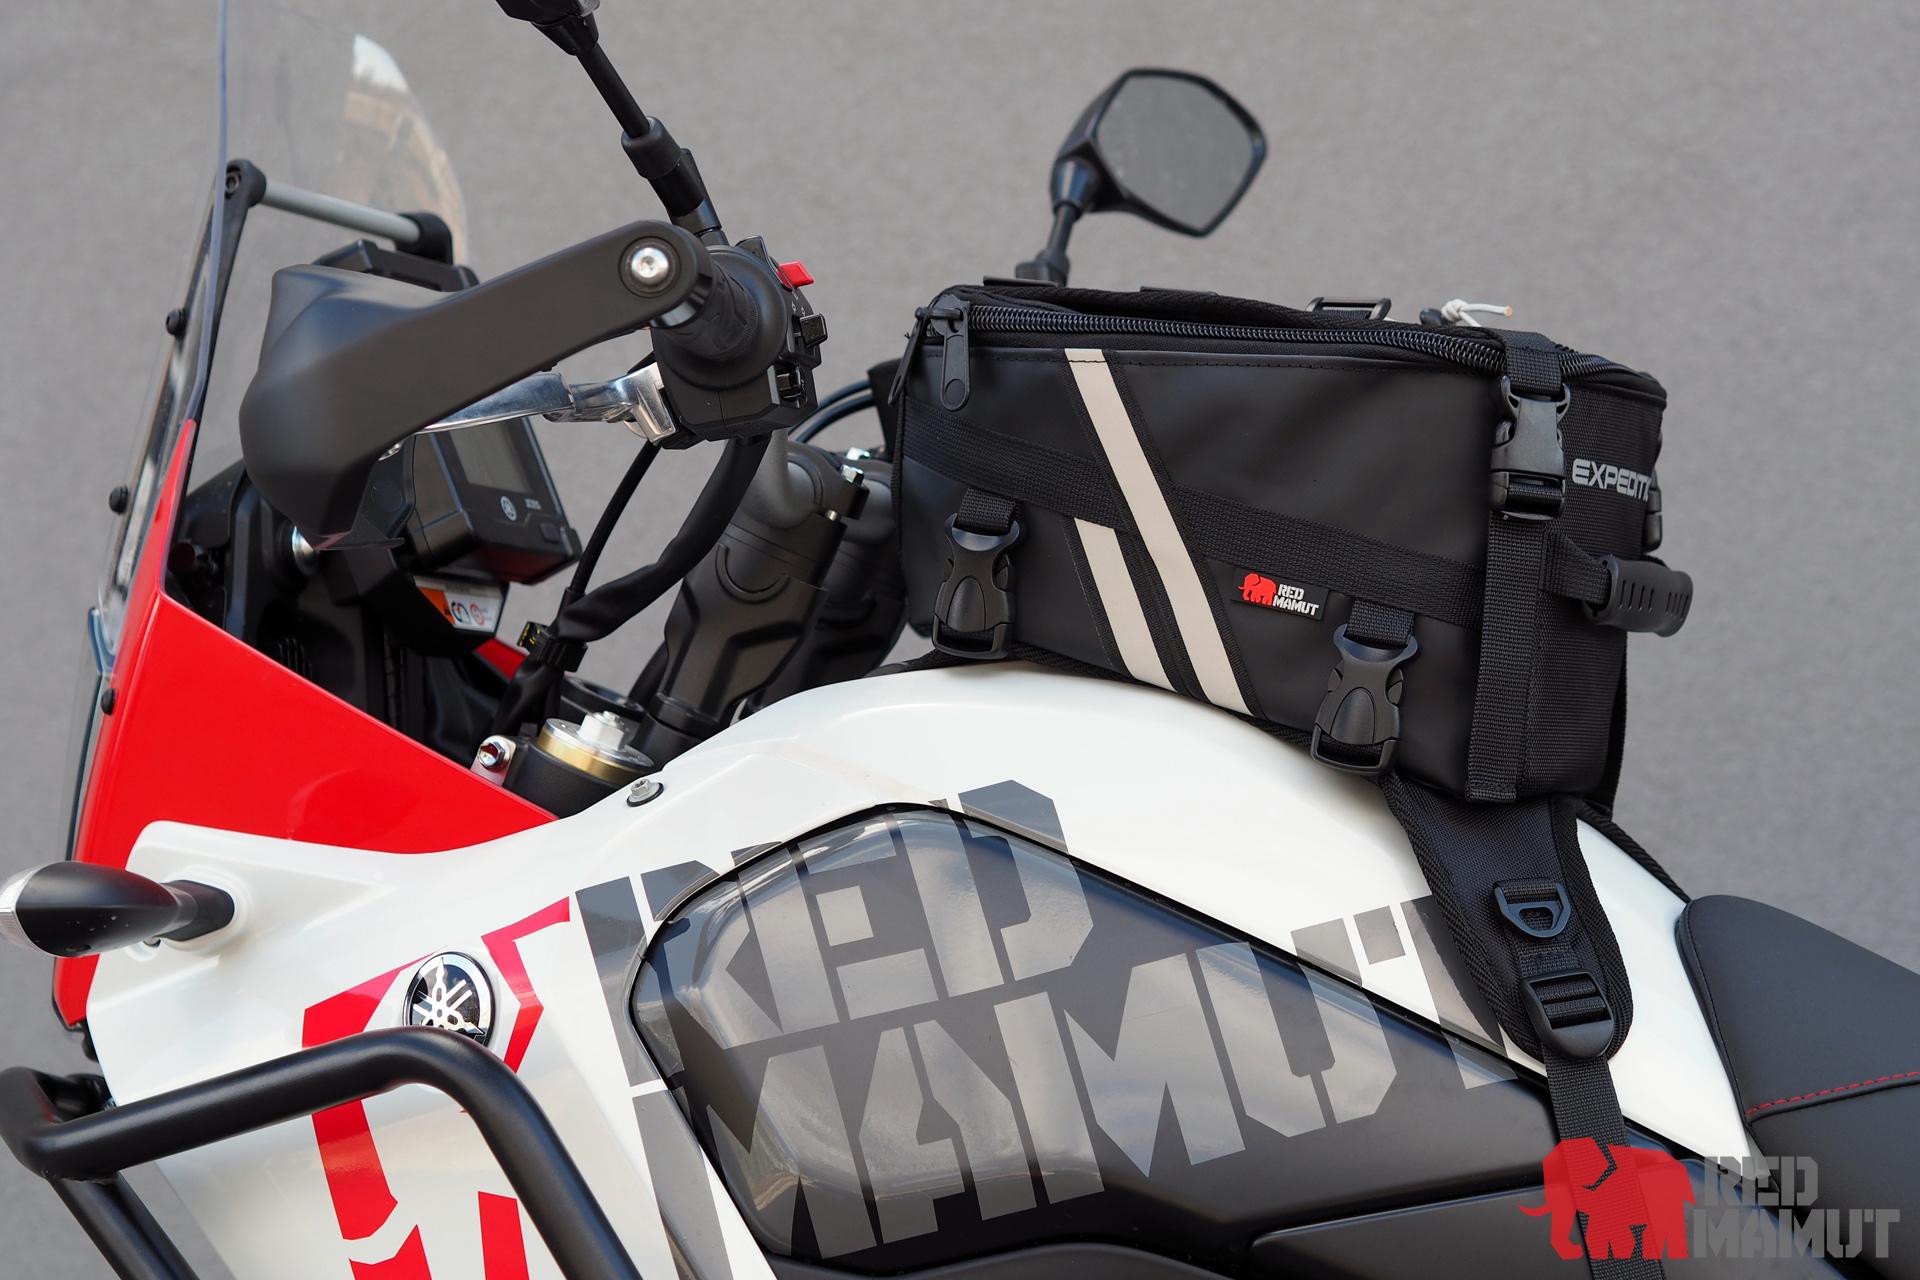 Tankbag EXPEDITION 7l Red Mamut